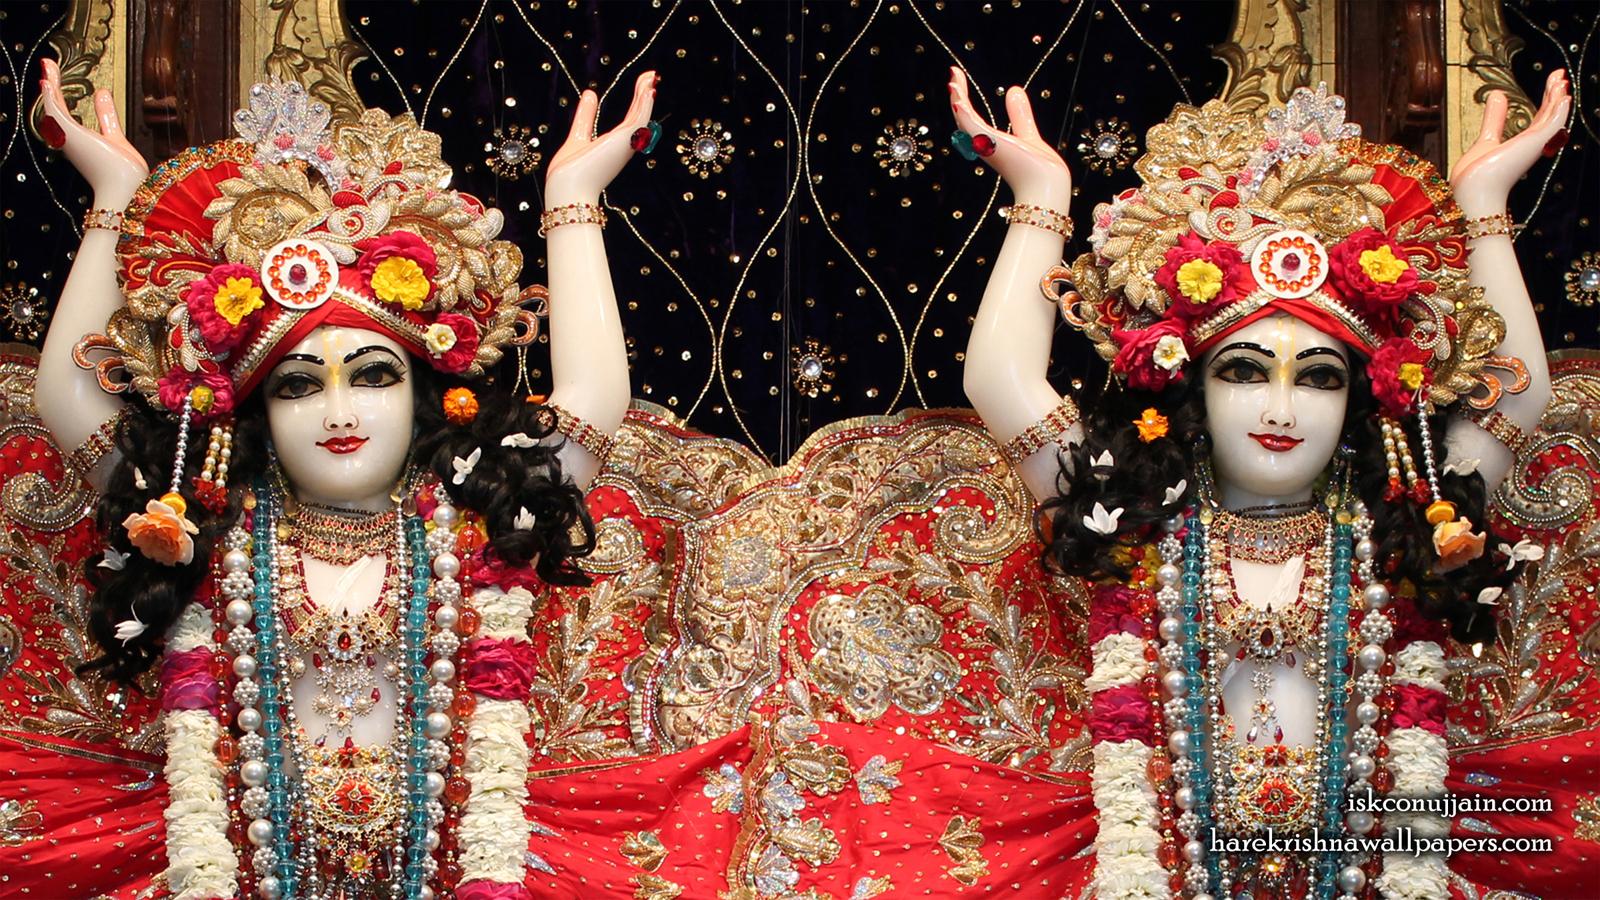 Sri Sri Gaura Nitai Close up Wallpaper (003) Size 1600x900 Download